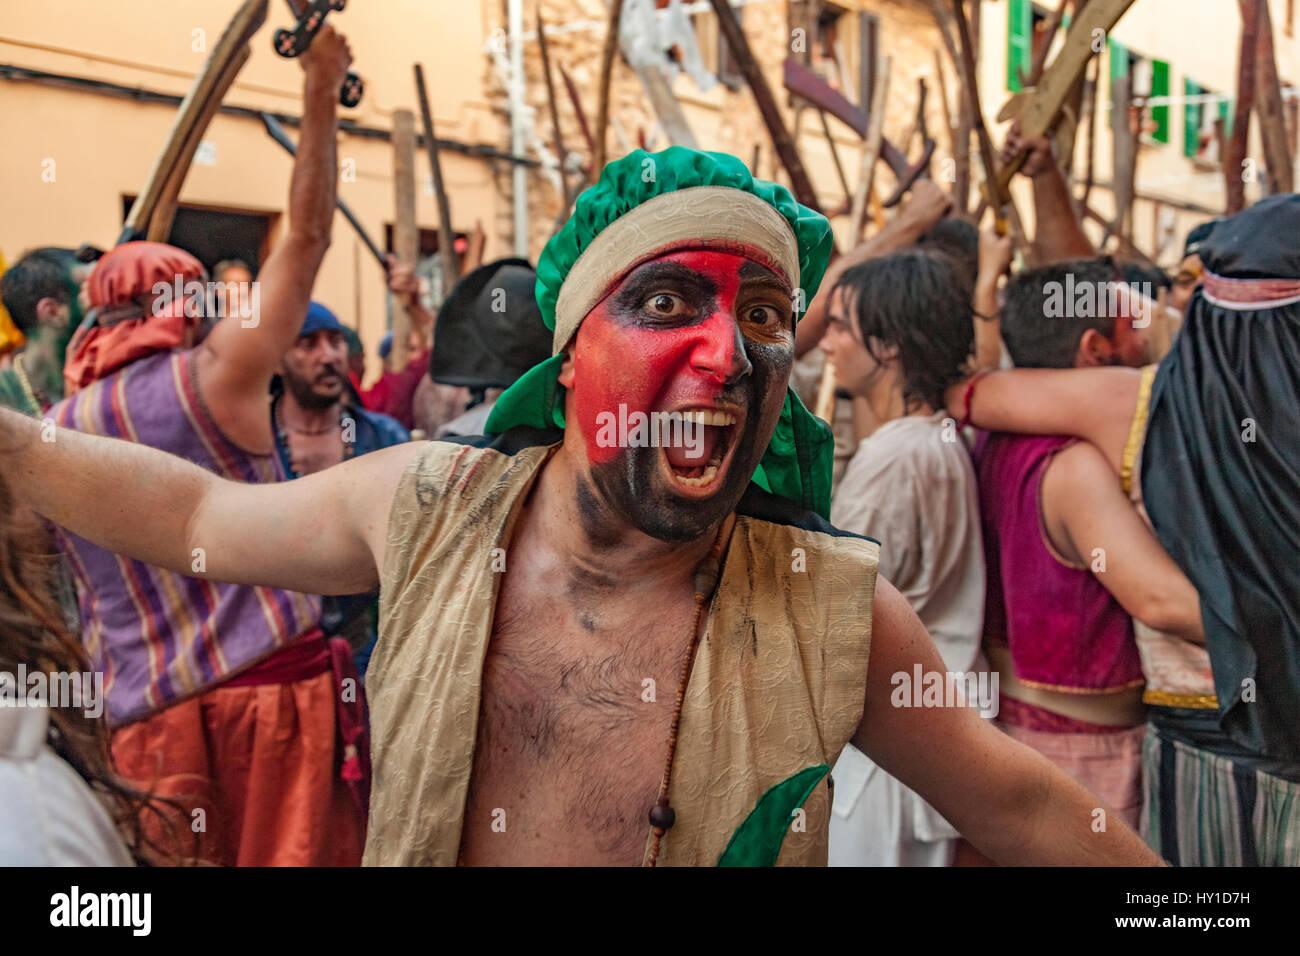 Pollenca. Moors battle against the Christians. Festival Annual. - Stock Image